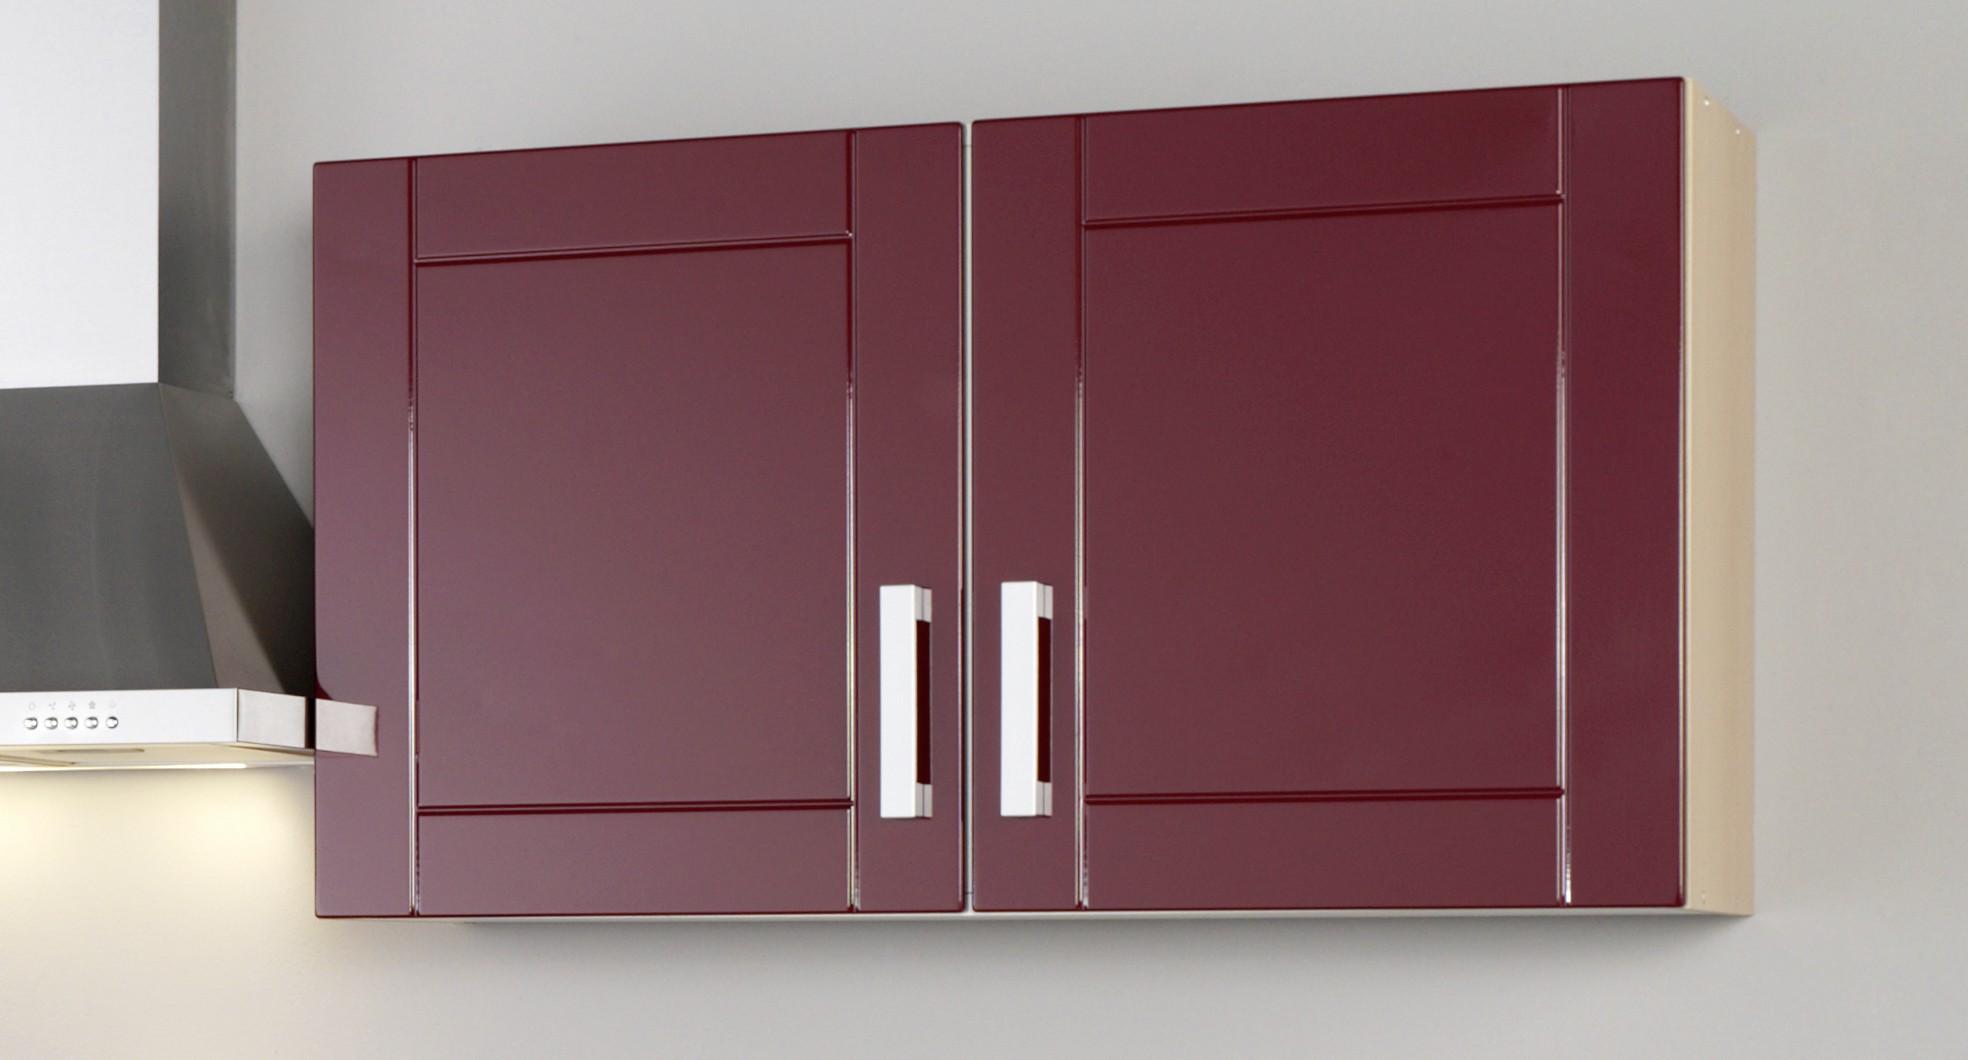 k chenblock ohne ger te einbauk che ohne elektroger te k chenzeile 210 cm rot ebay. Black Bedroom Furniture Sets. Home Design Ideas